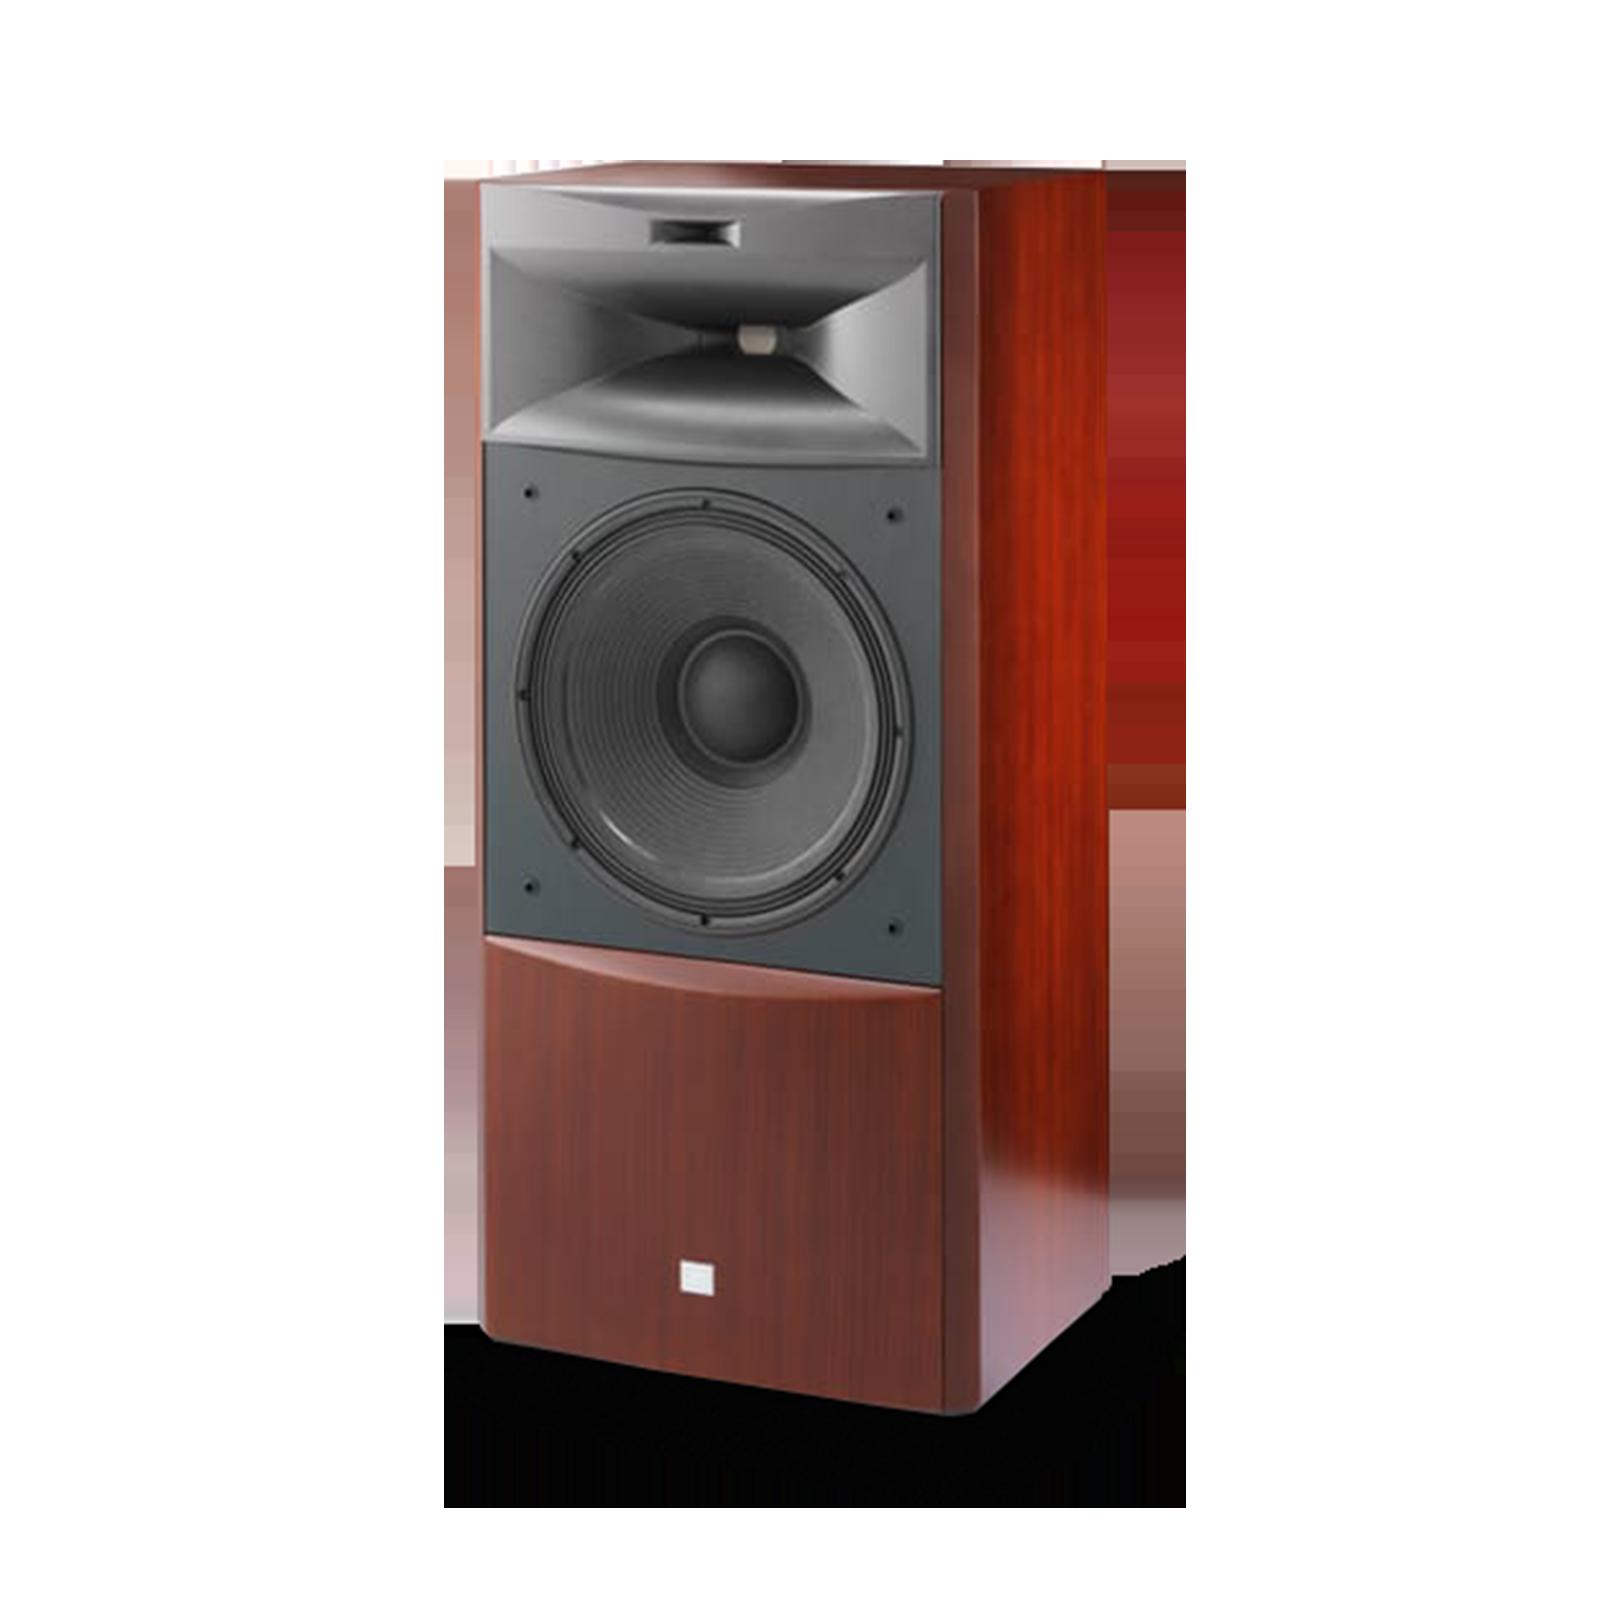 "JBL S4700 - Cherry - 3-way 15"" (380mm) Floorstanding Loudspeaker - Detailshot 1"